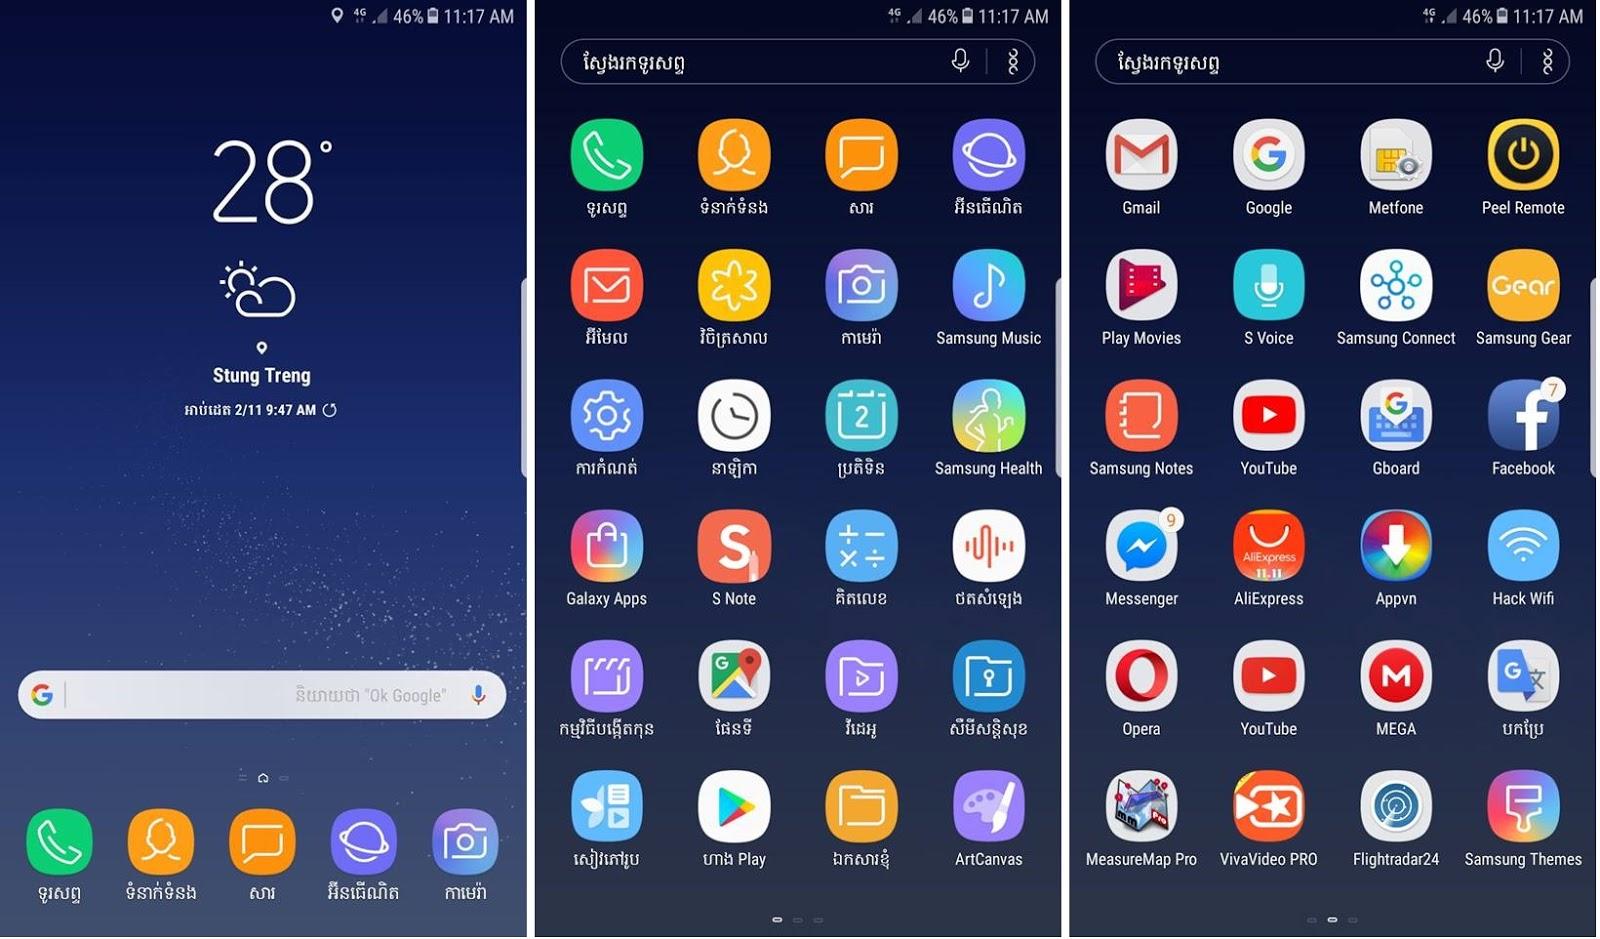 Edge S6 I Rom Plus Fix Samsung 9 Galaxy Sopheak Sm-g928t